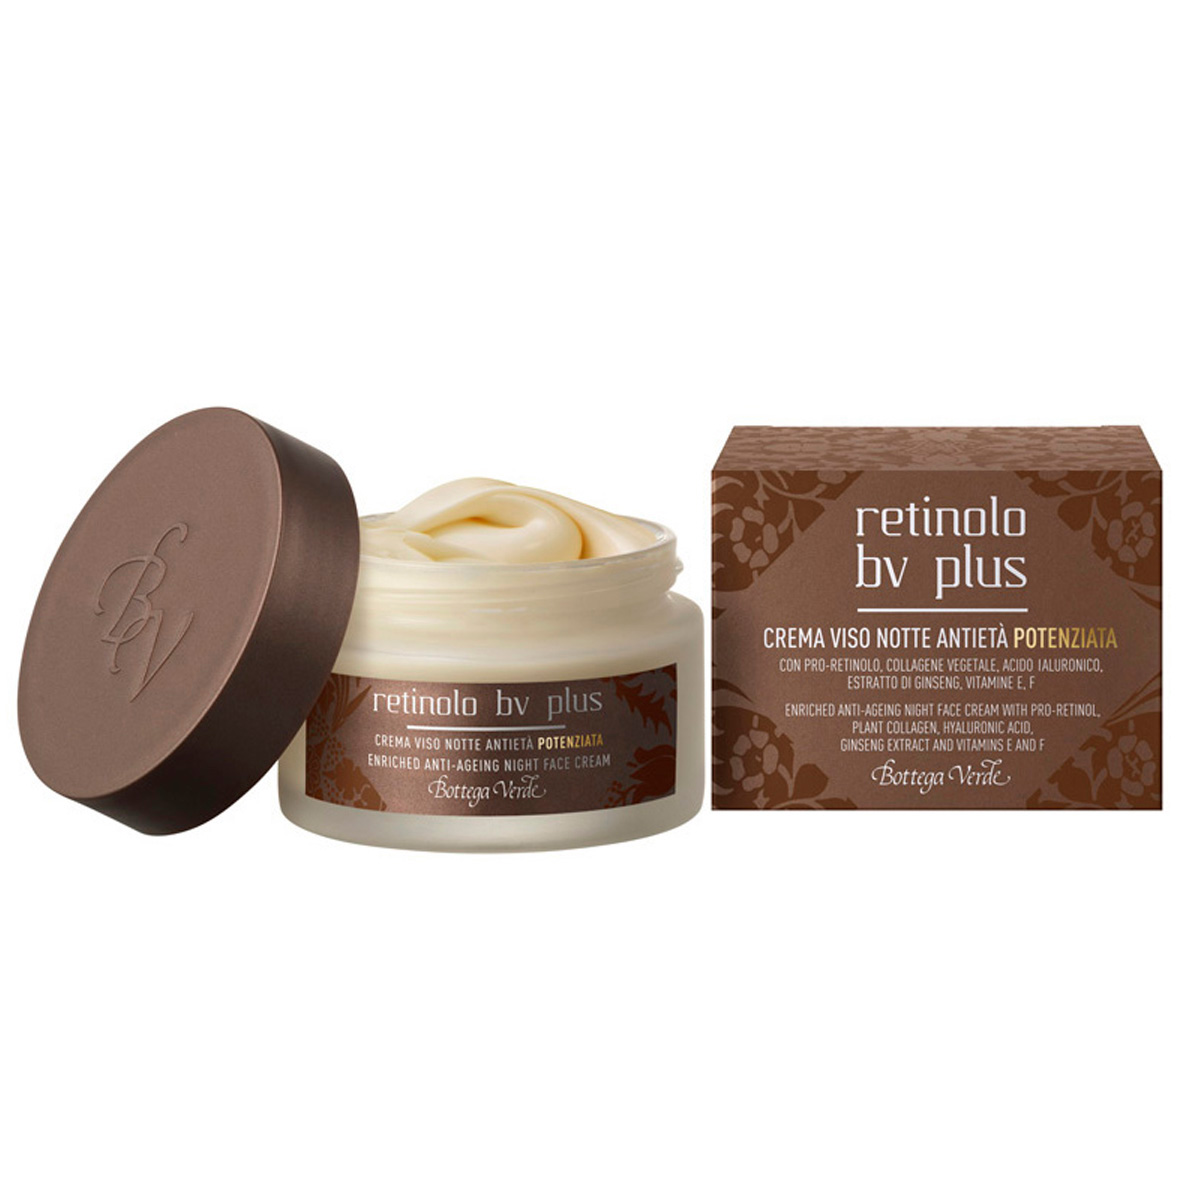 Retinolo Bv Plus - Crema de noapte anti-imbatranire cu Pro - Retinol, Colagen vegetal, acid hialuronic, extract de ginseng si vitamina E, F